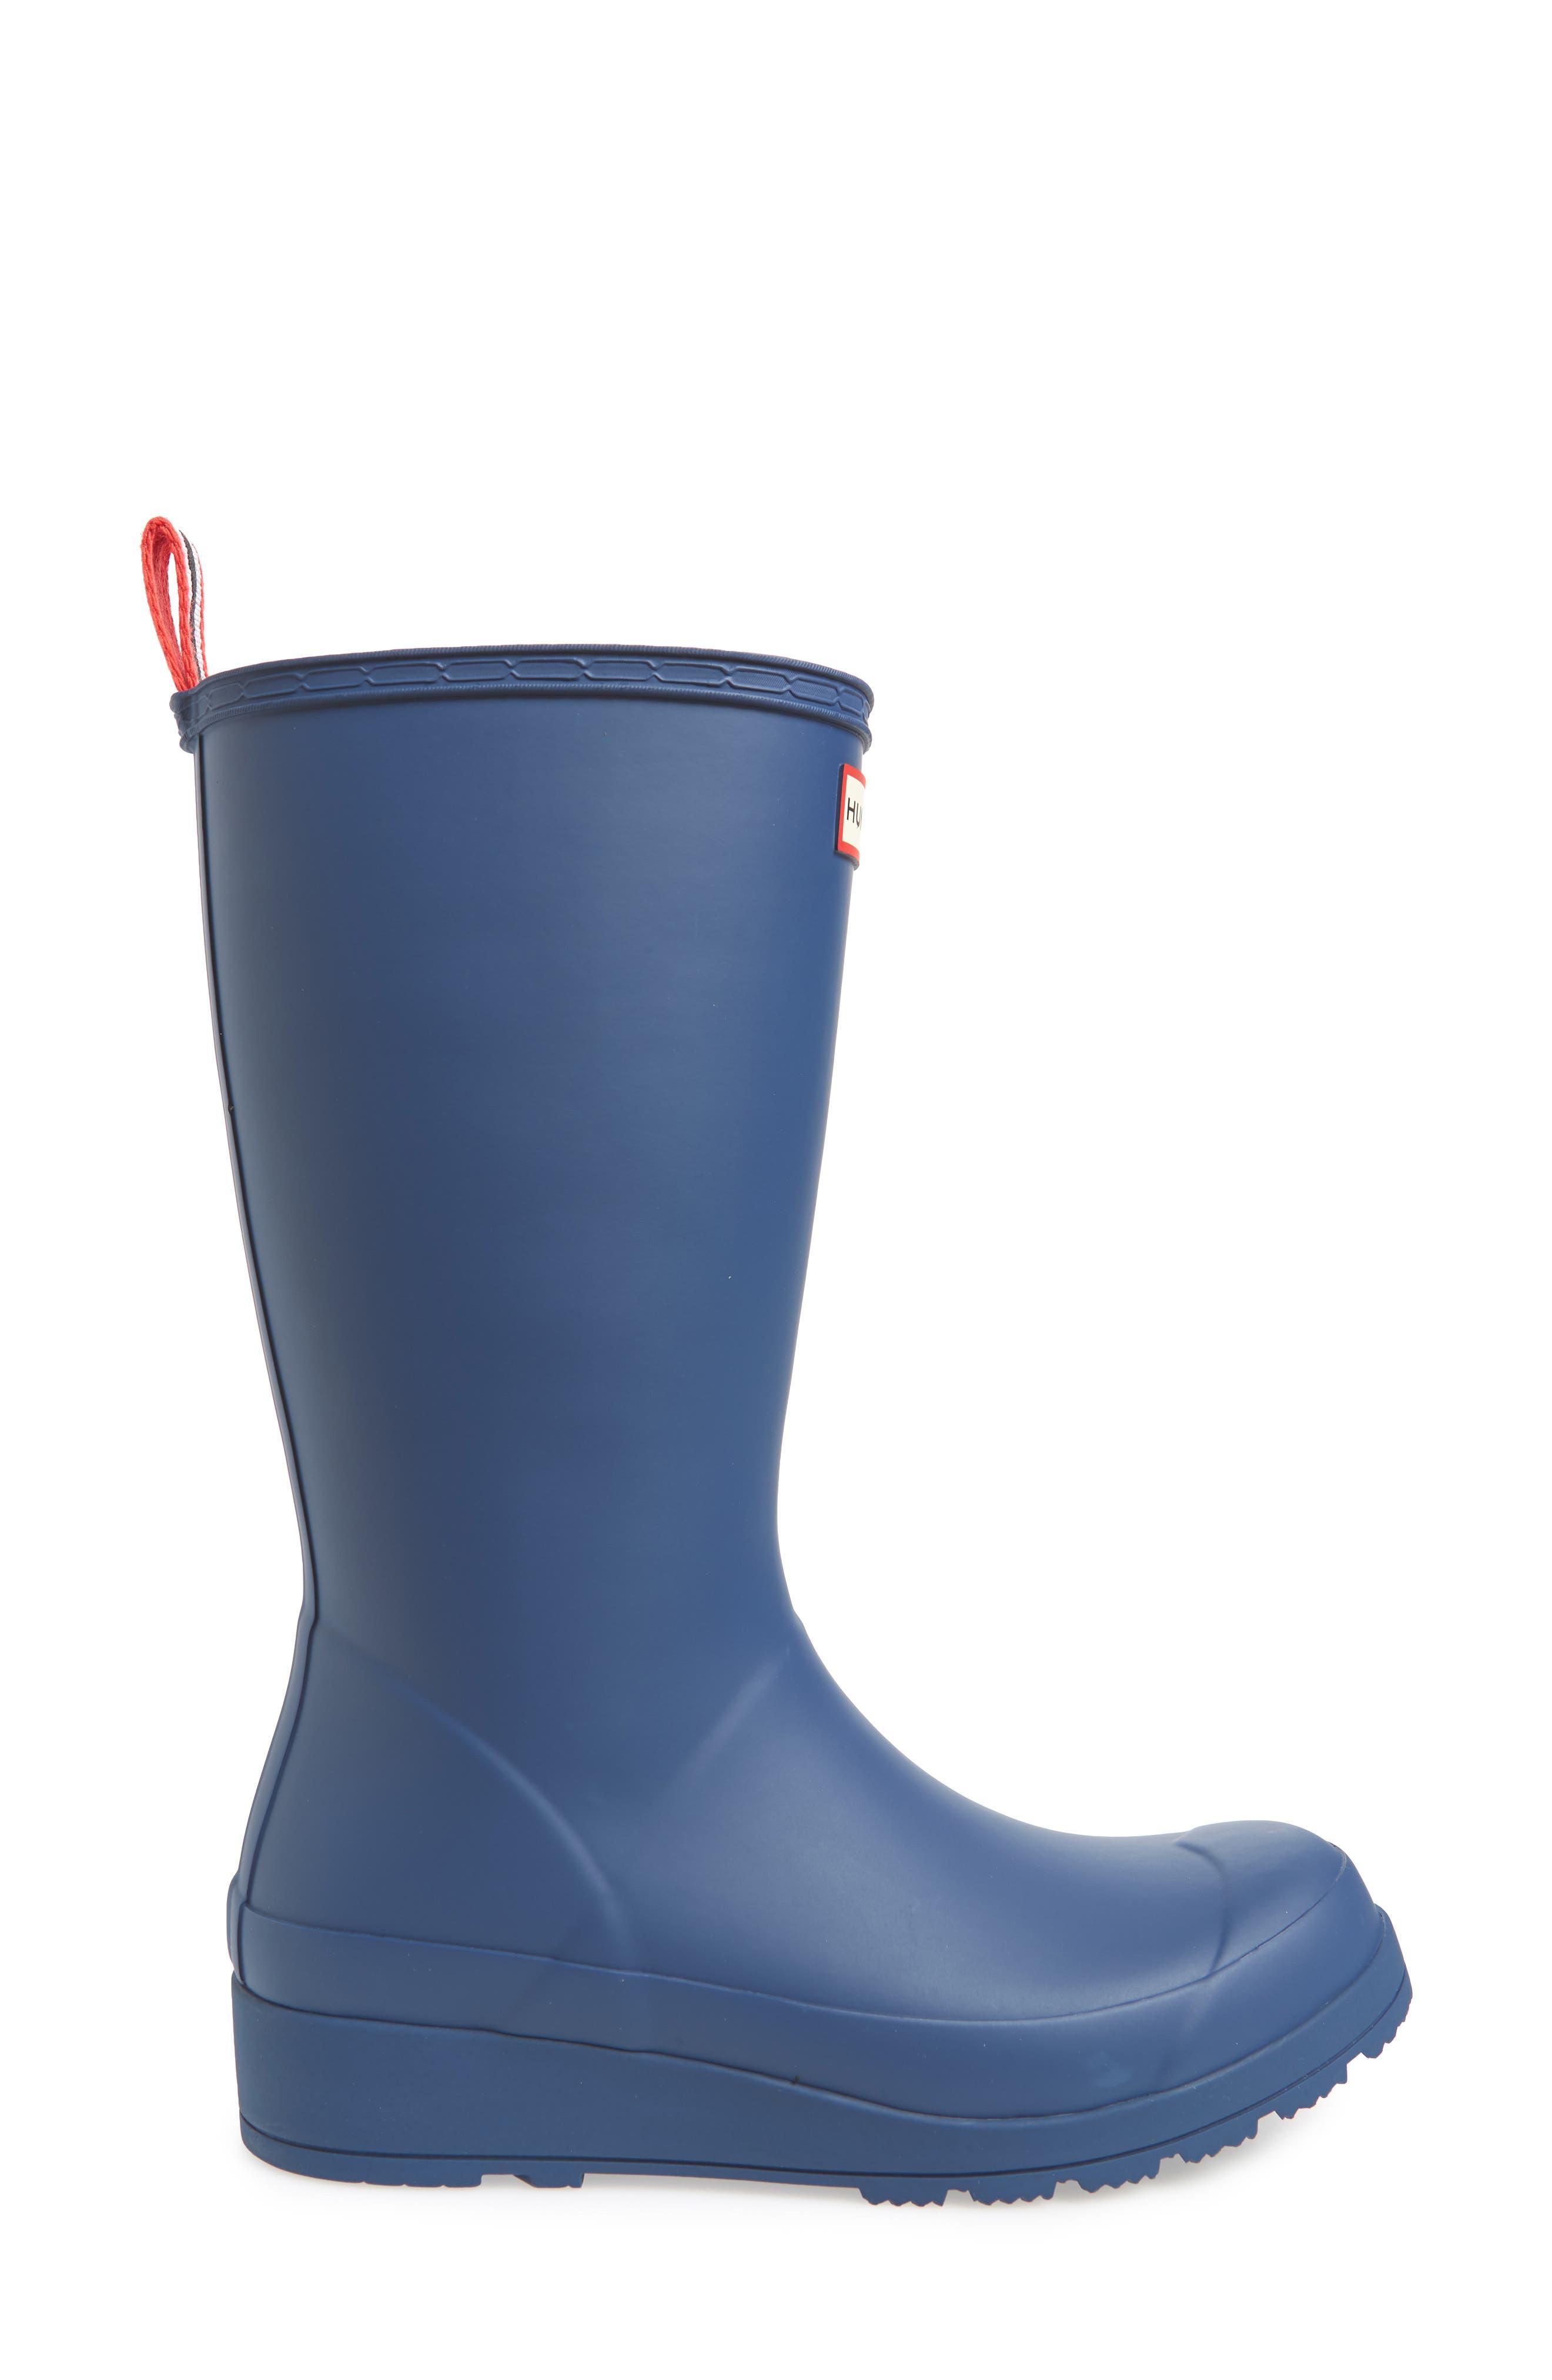 Original Play Tall Rain Boot,                             Alternate thumbnail 3, color,                             PEAK BLUE